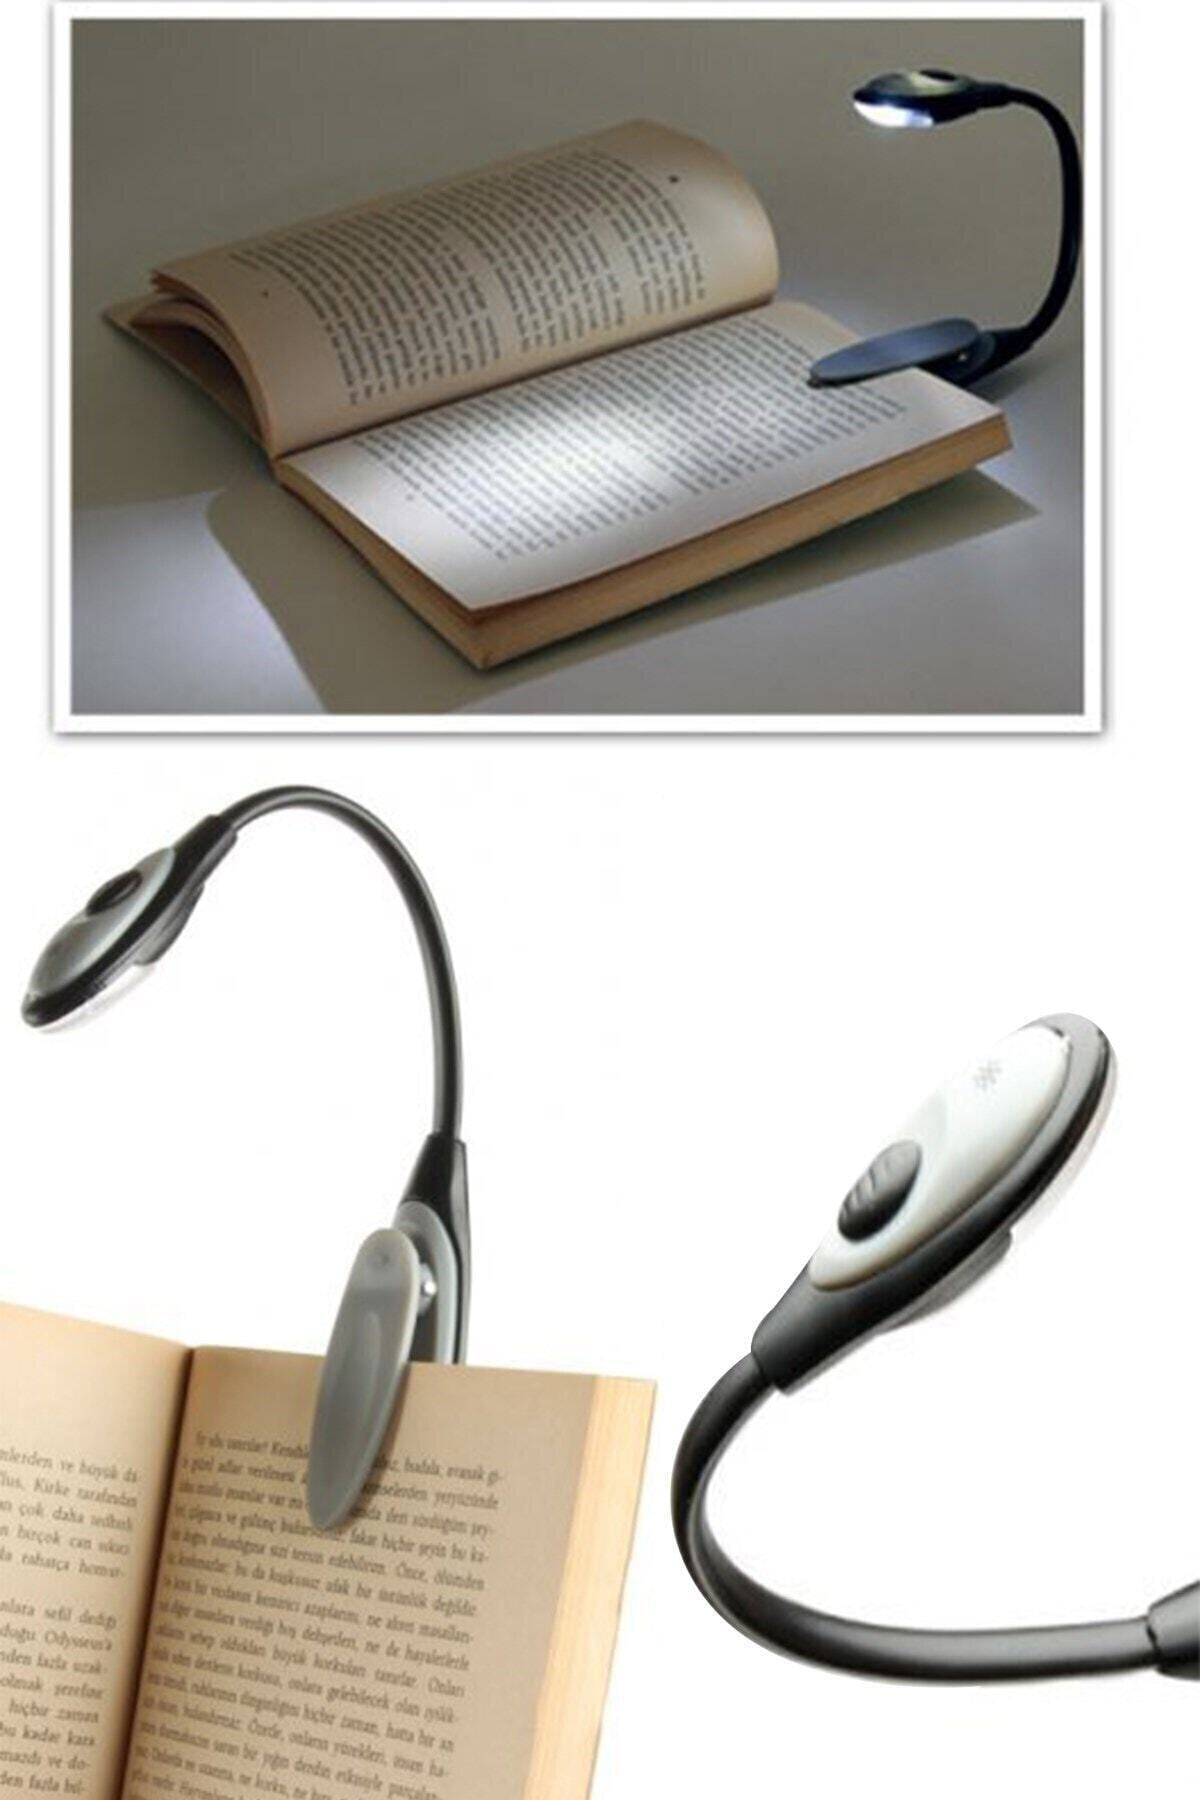 Mandallı Led Kitap Okuma Lambası Desk Kitap Okuma Işığı Led Masa Lambası